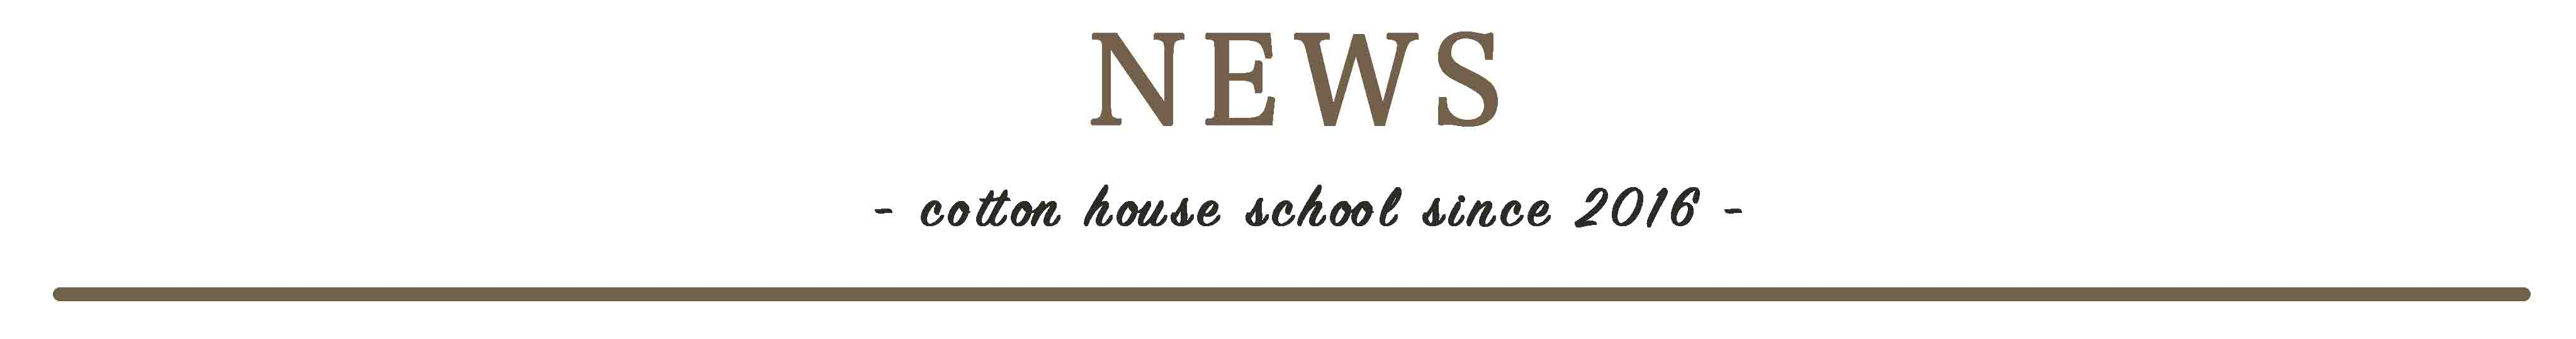 NEWS(SCHOOL)